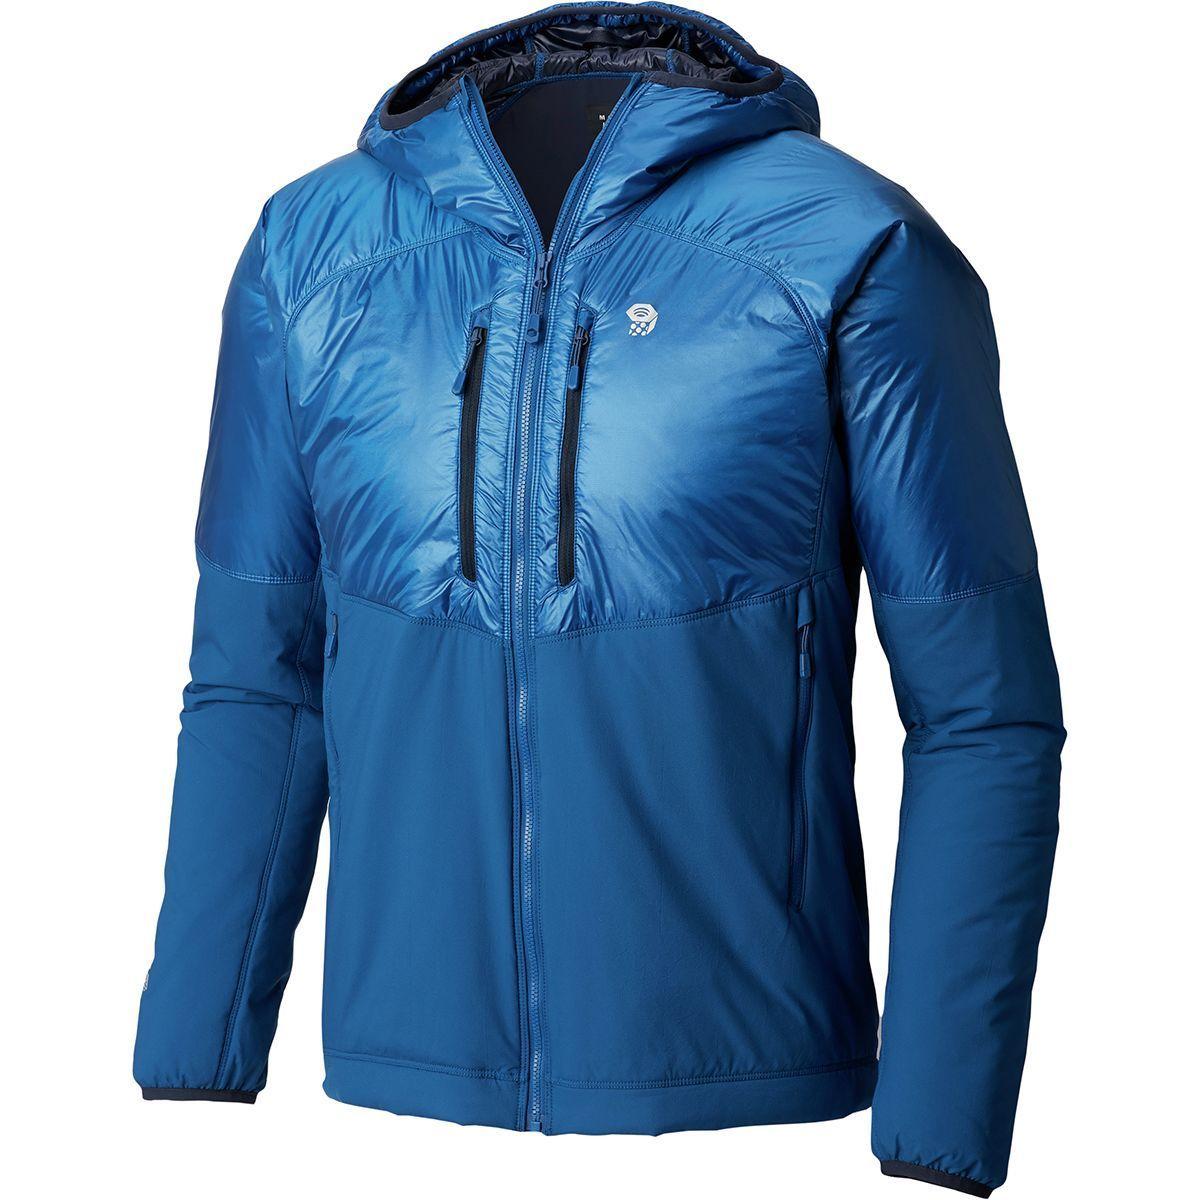 Veste à capuche Kor Strata Alpine - Homme -  Mountain Hardwear Manteau à capuchon Kor Strata Alpine – Homme  - #alpine #capuche #curbywomen #getal #Homme #Kor #lingrie #loving #people #presentideasforwomen #strata #veste #womenbodybuilders